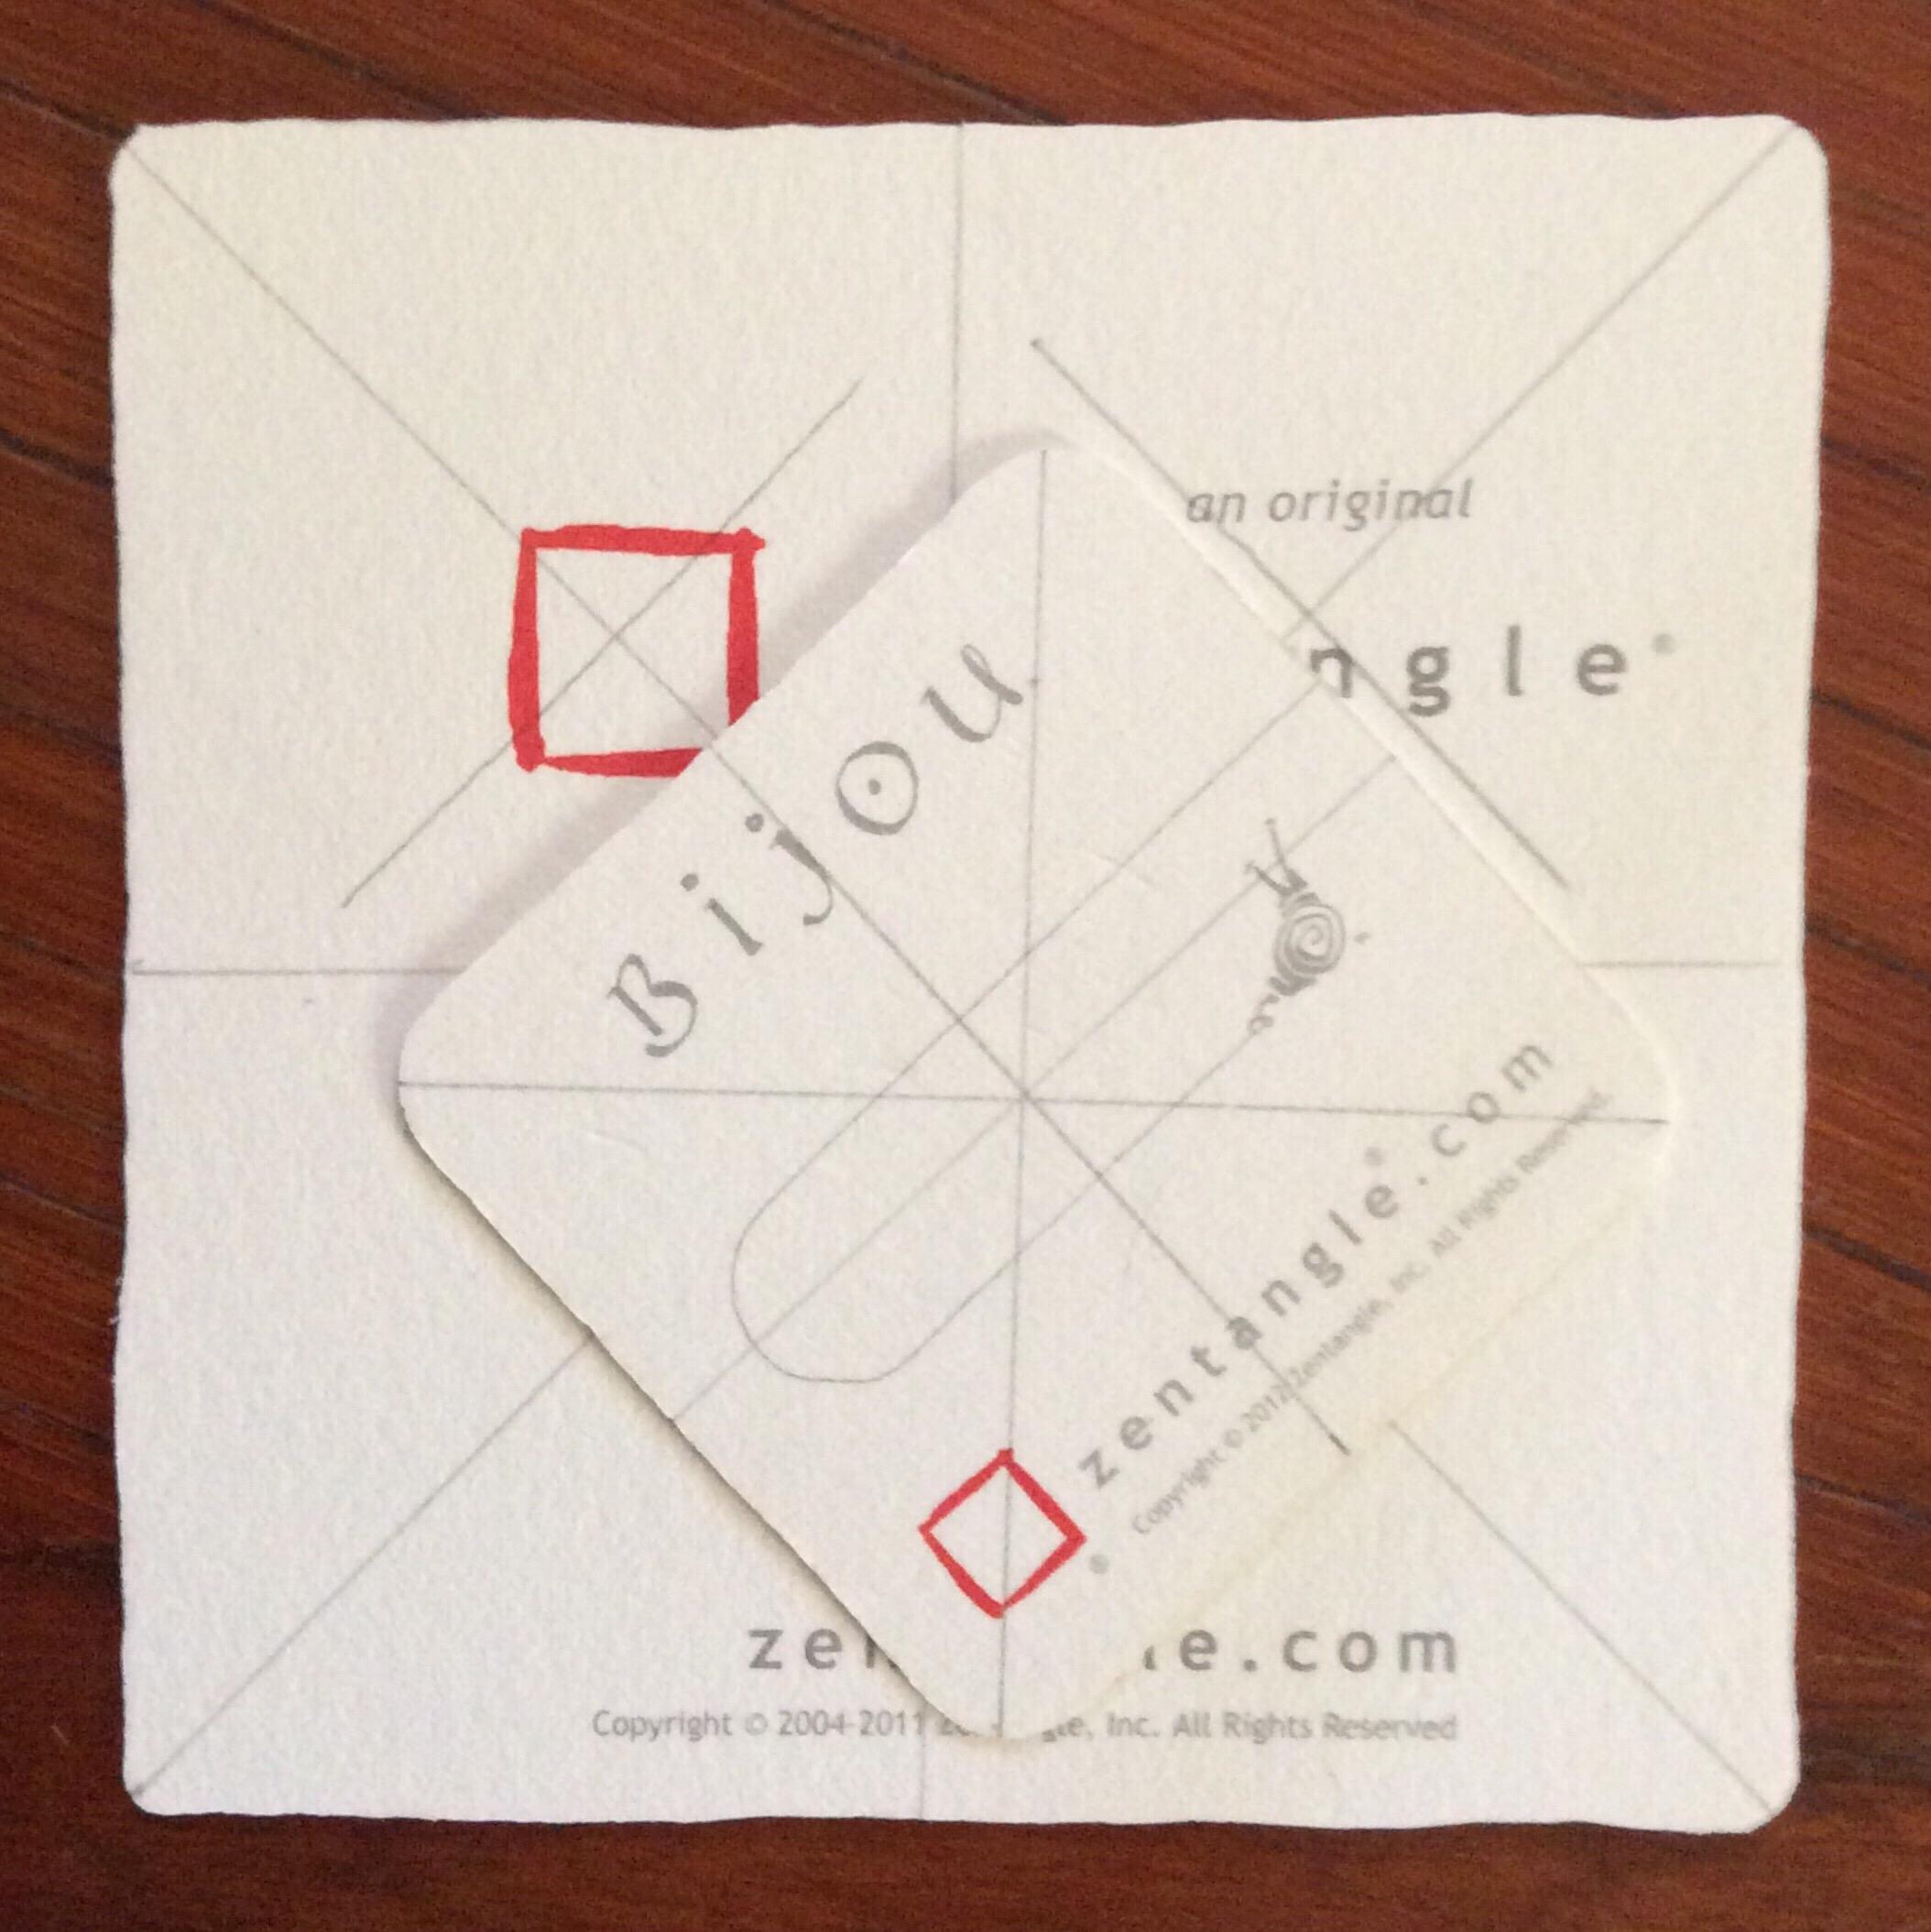 VistaPrint square business card holder – TangleSXM